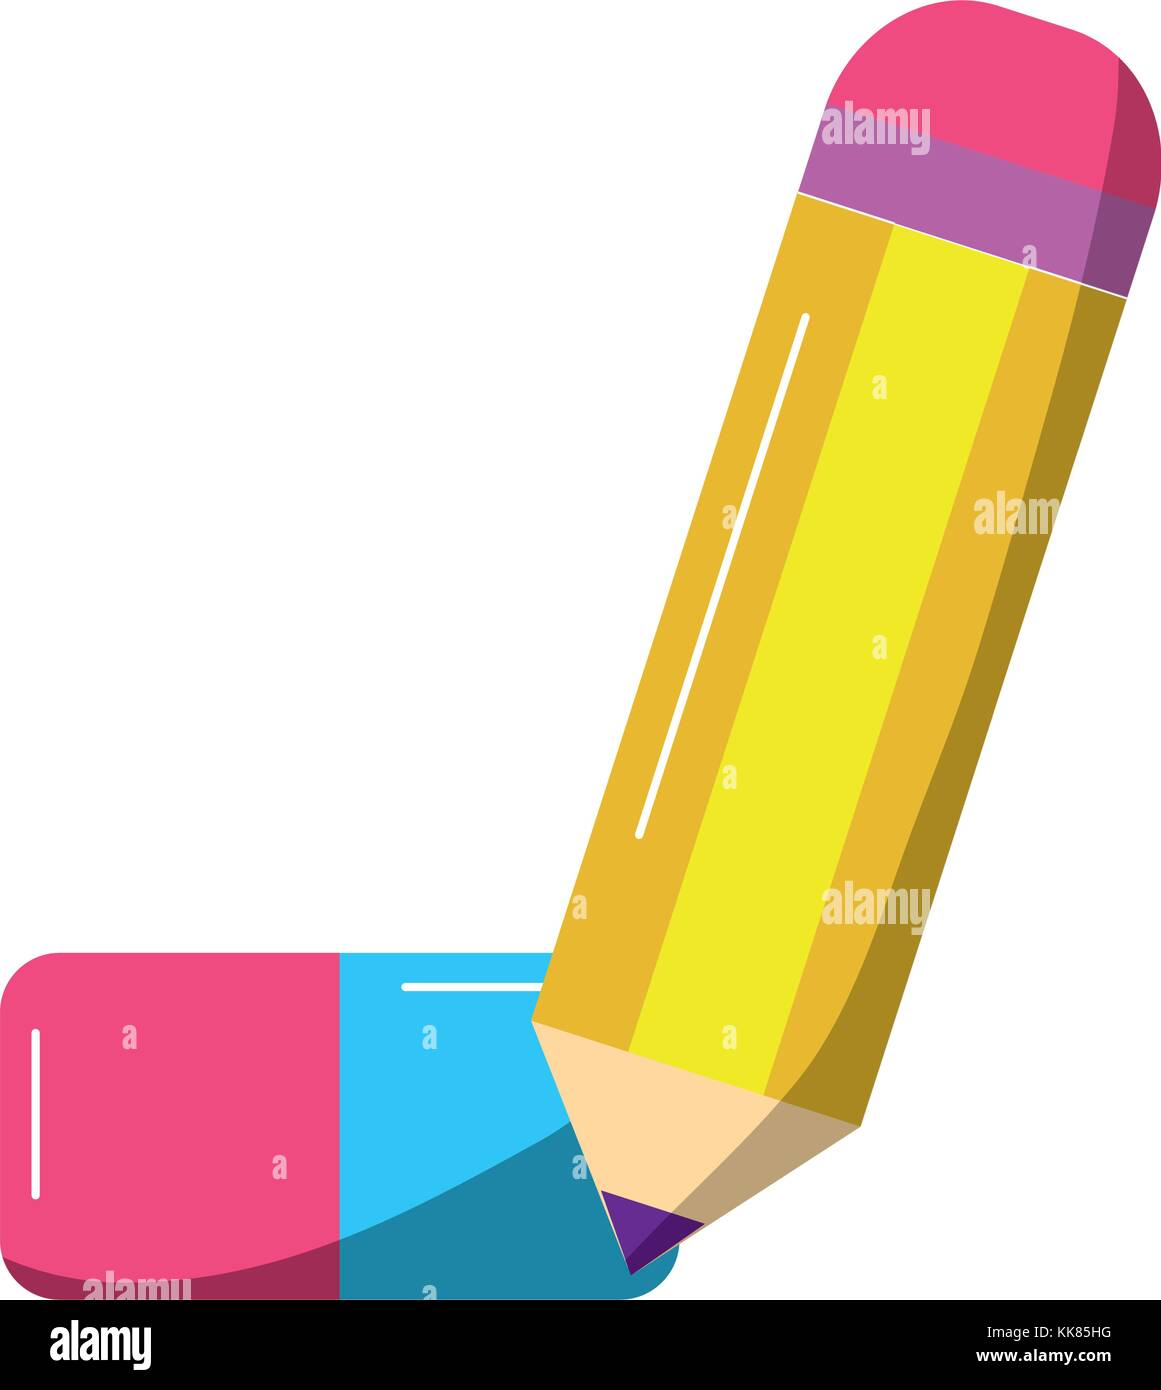 school supplies icon image  - Stock Vector